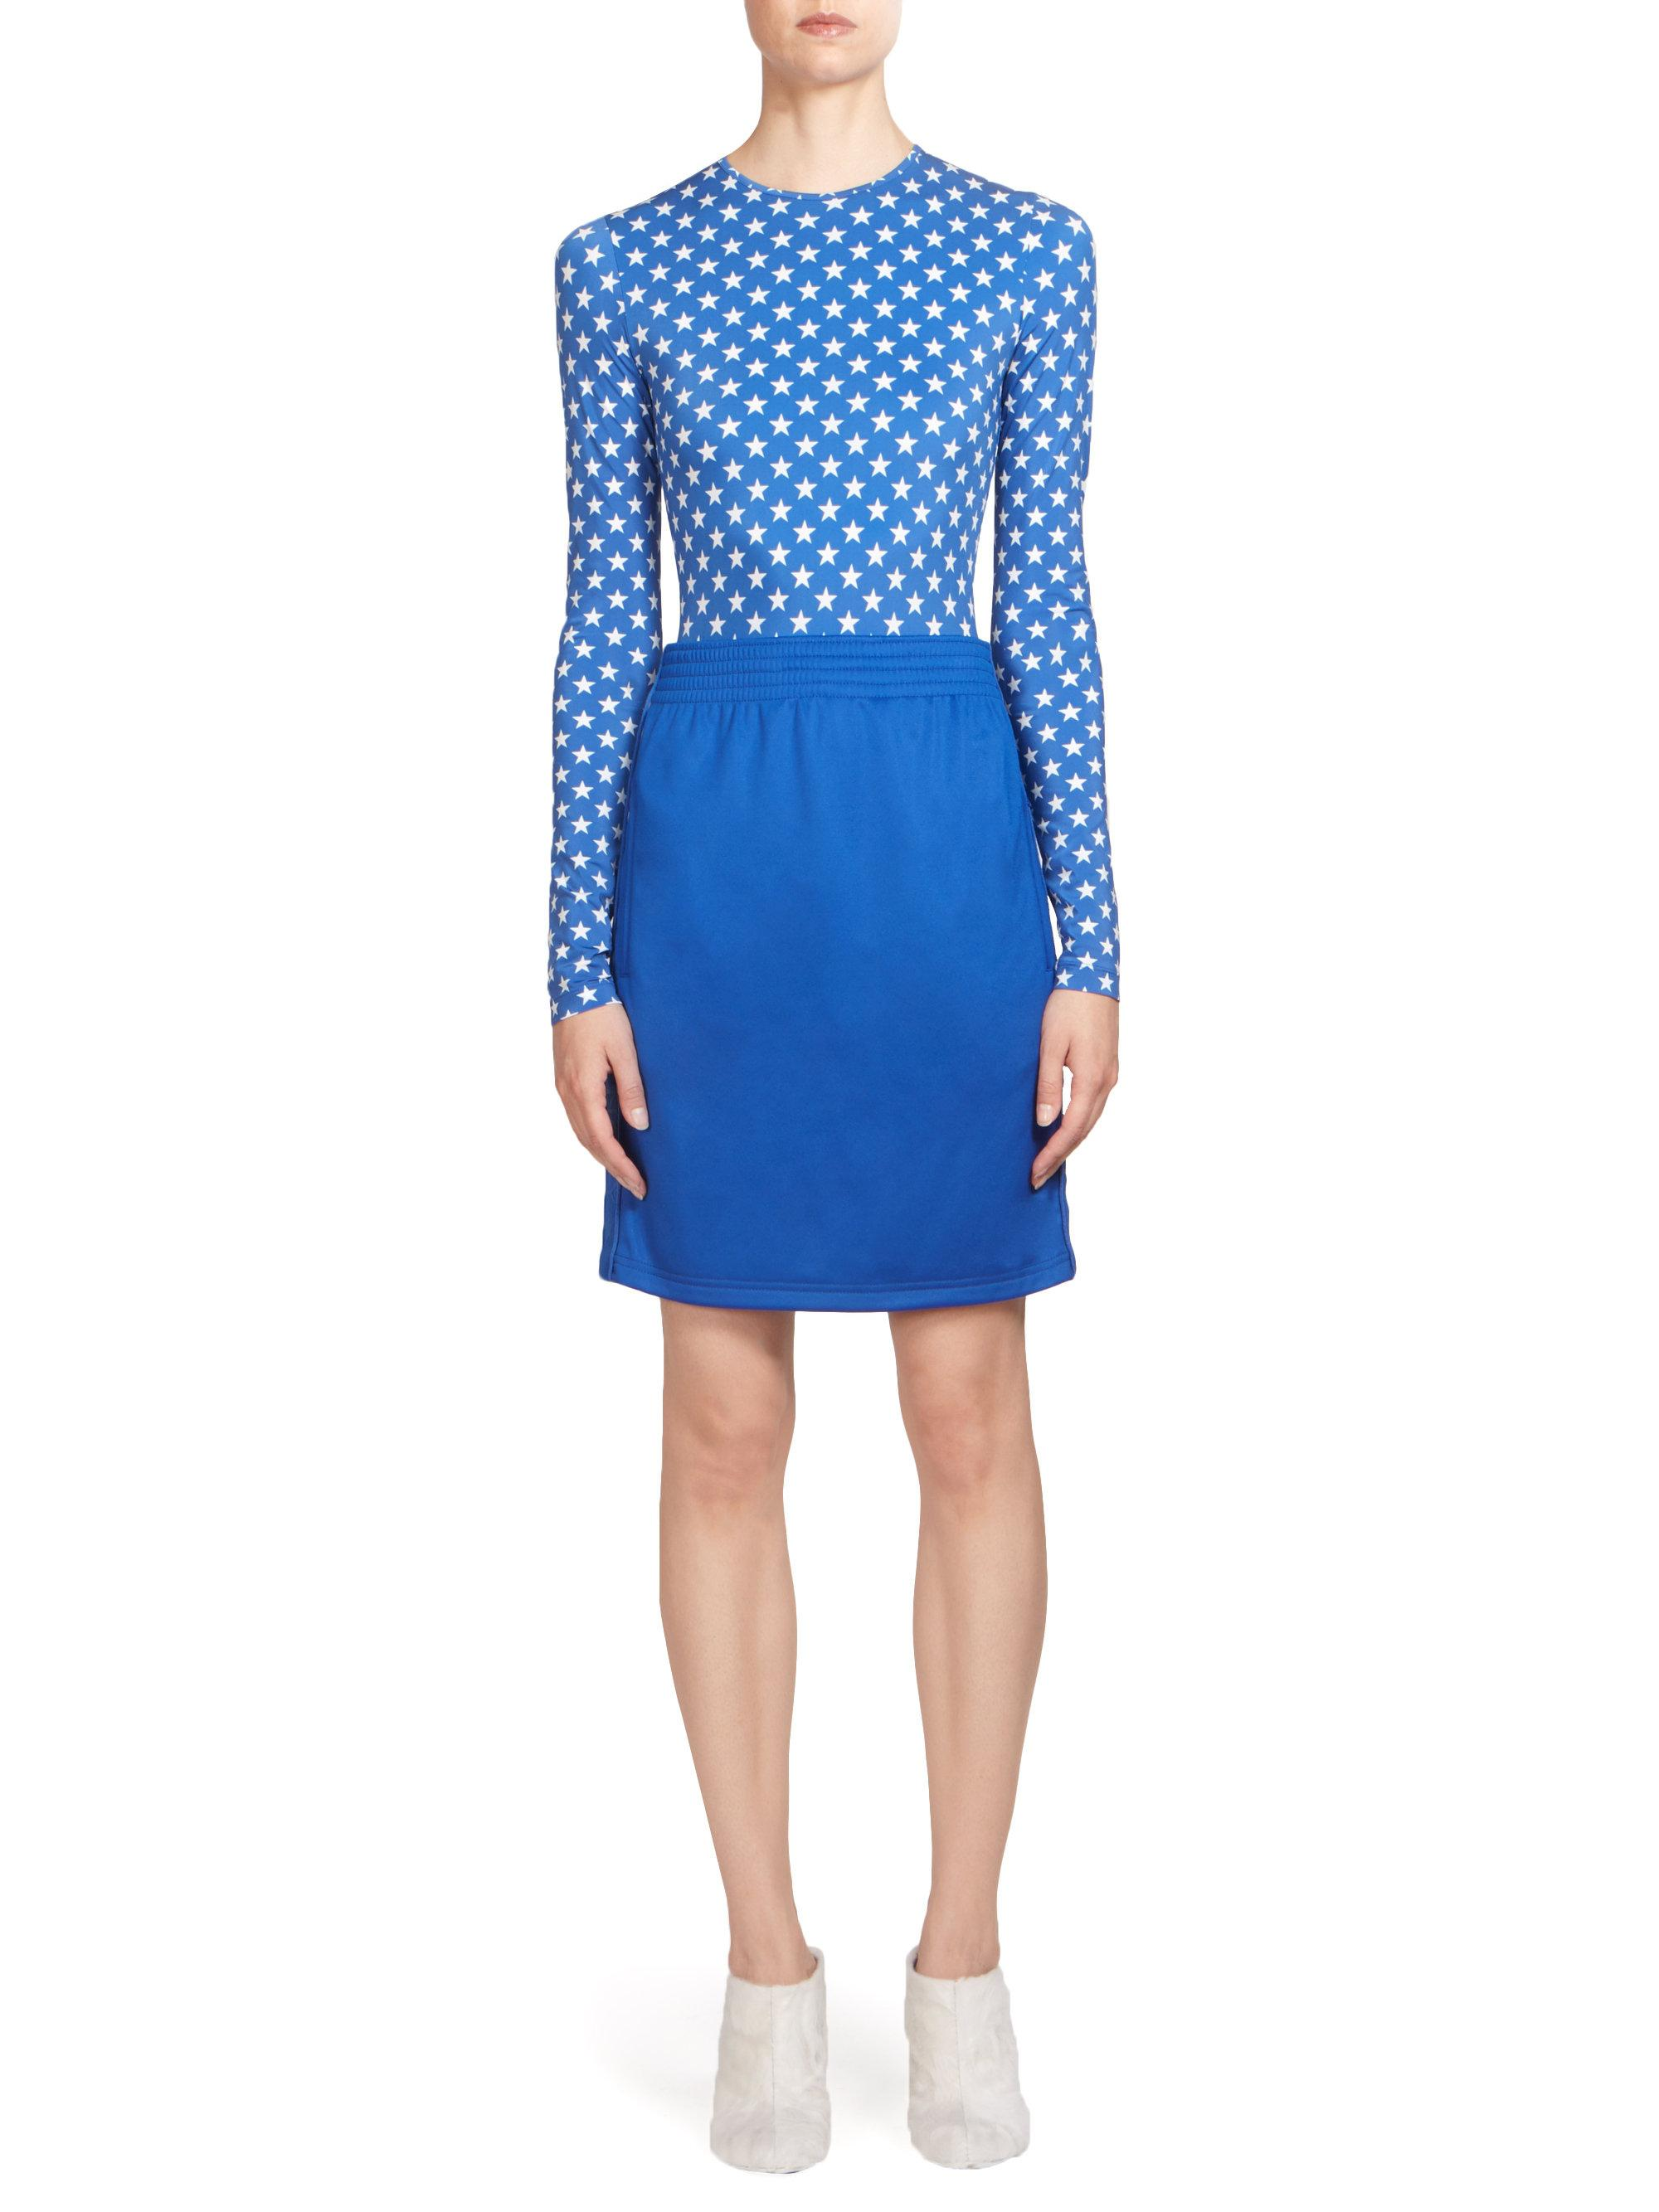 9efbbebba5a67 Lyst - Givenchy Star Print Bodysuit in Blue